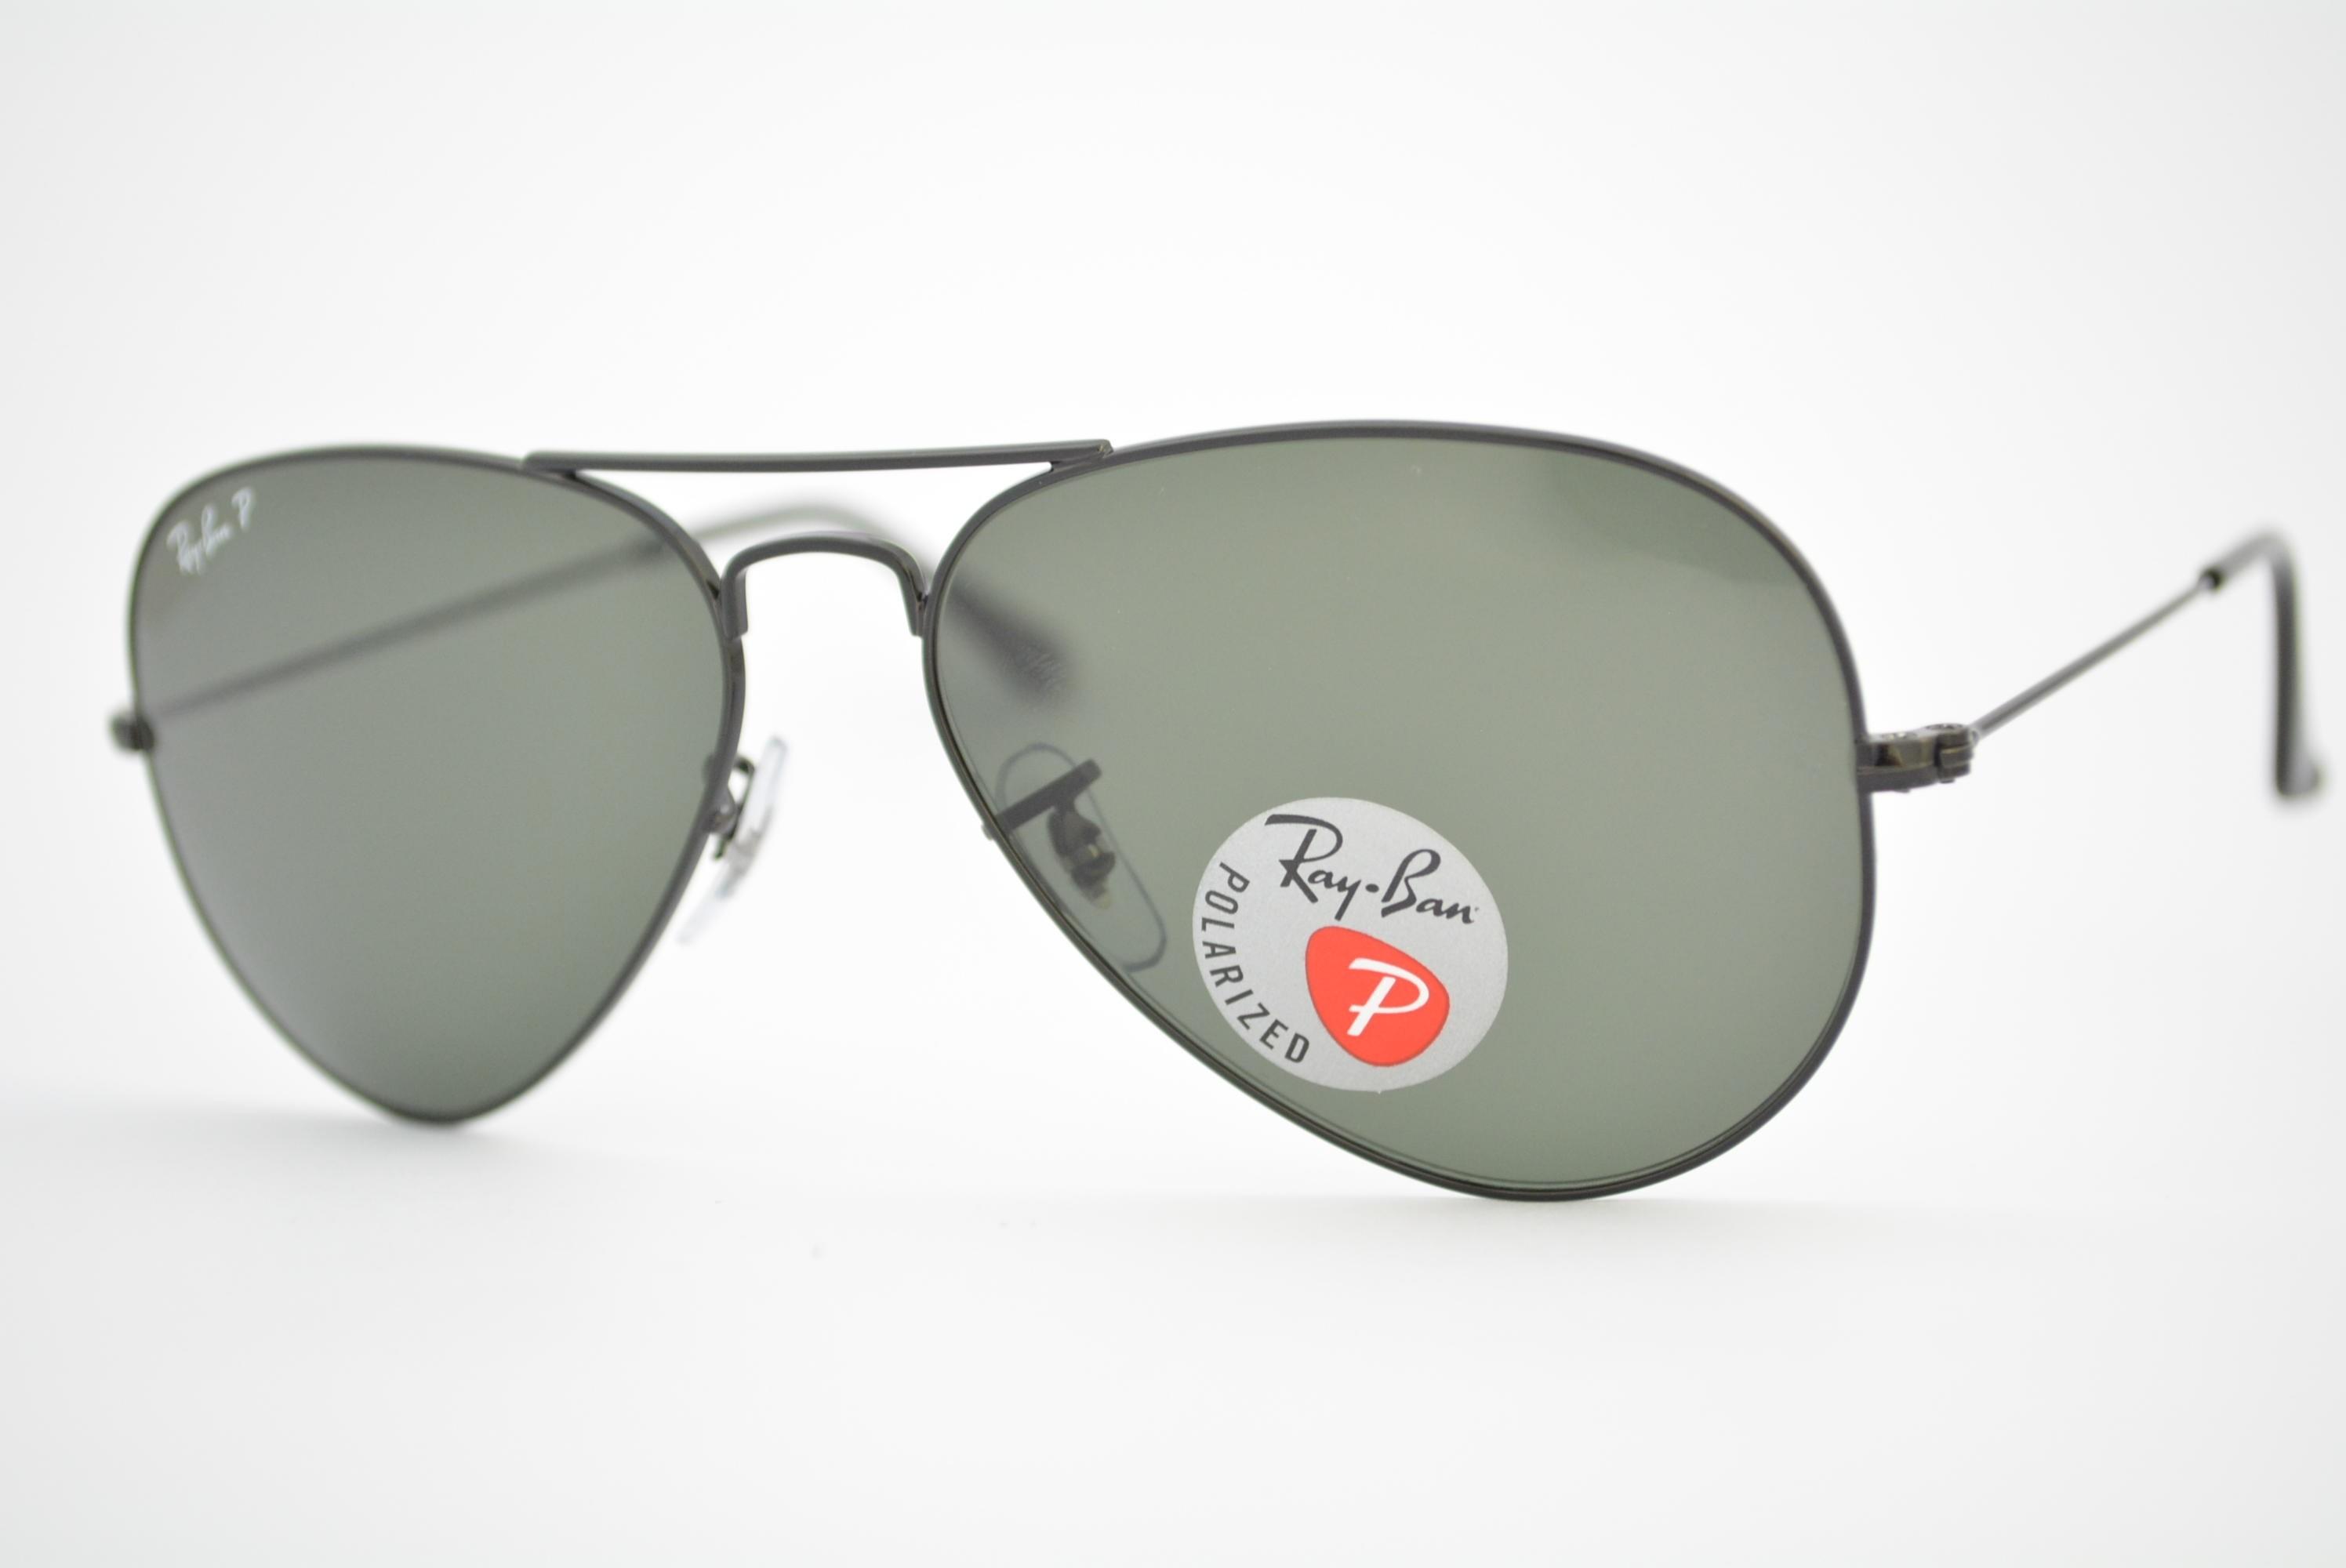 óculos de sol Ray Ban aviator large mod rb3025 002/58 tamanho 55 polarizado